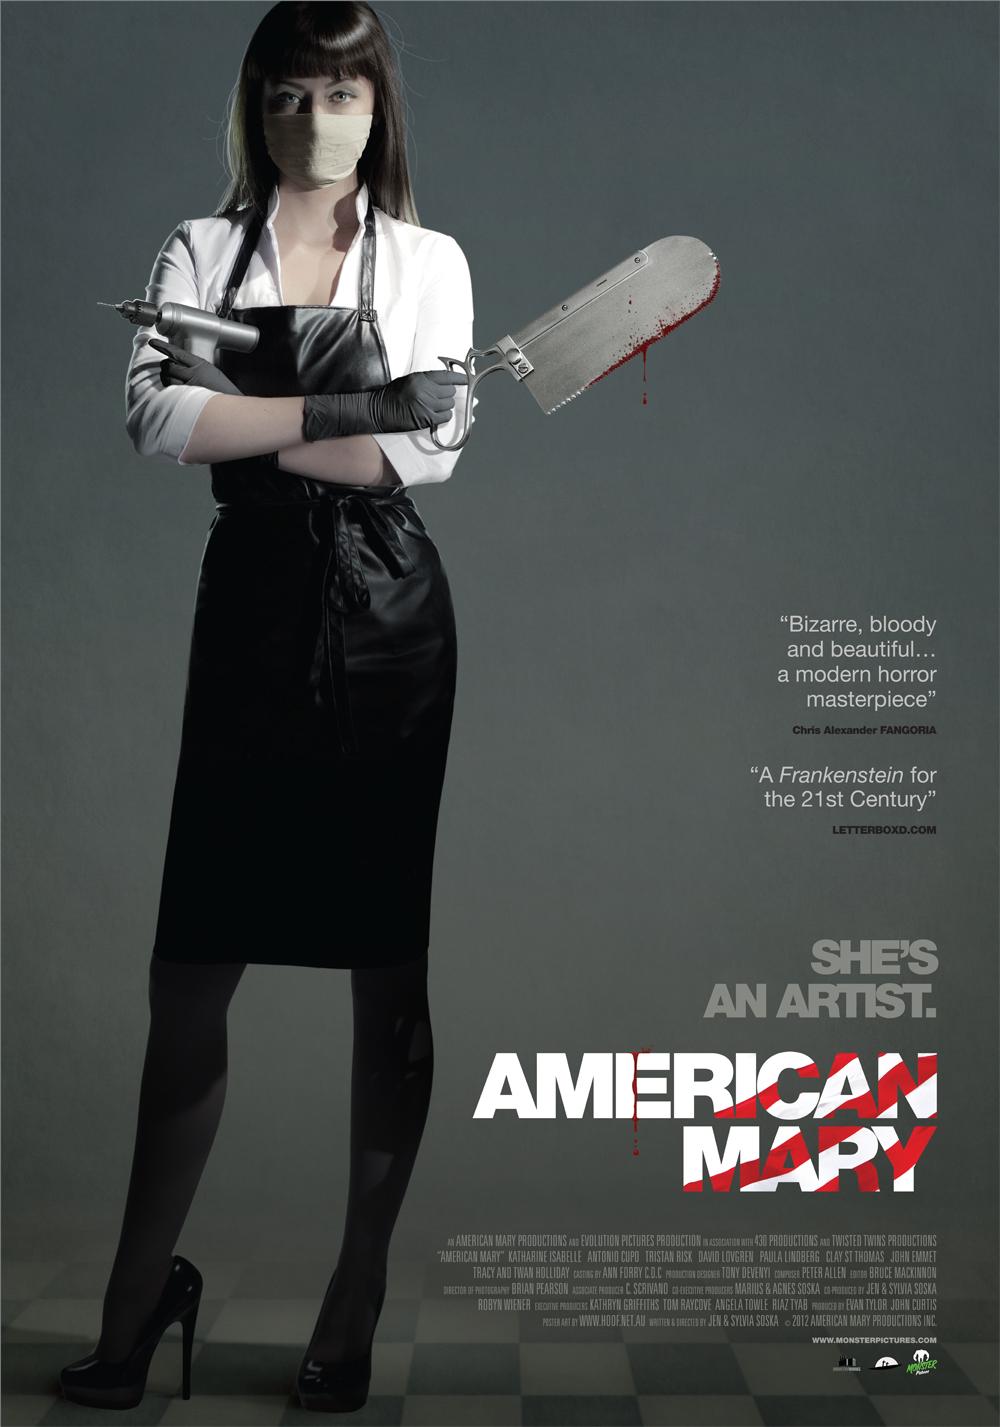 http://4.bp.blogspot.com/-pkqZYaB4Ej8/UL7oGea-rsI/AAAAAAAABHw/BIa197UV6Fs/s1600/American-Mary-posterb.jpg